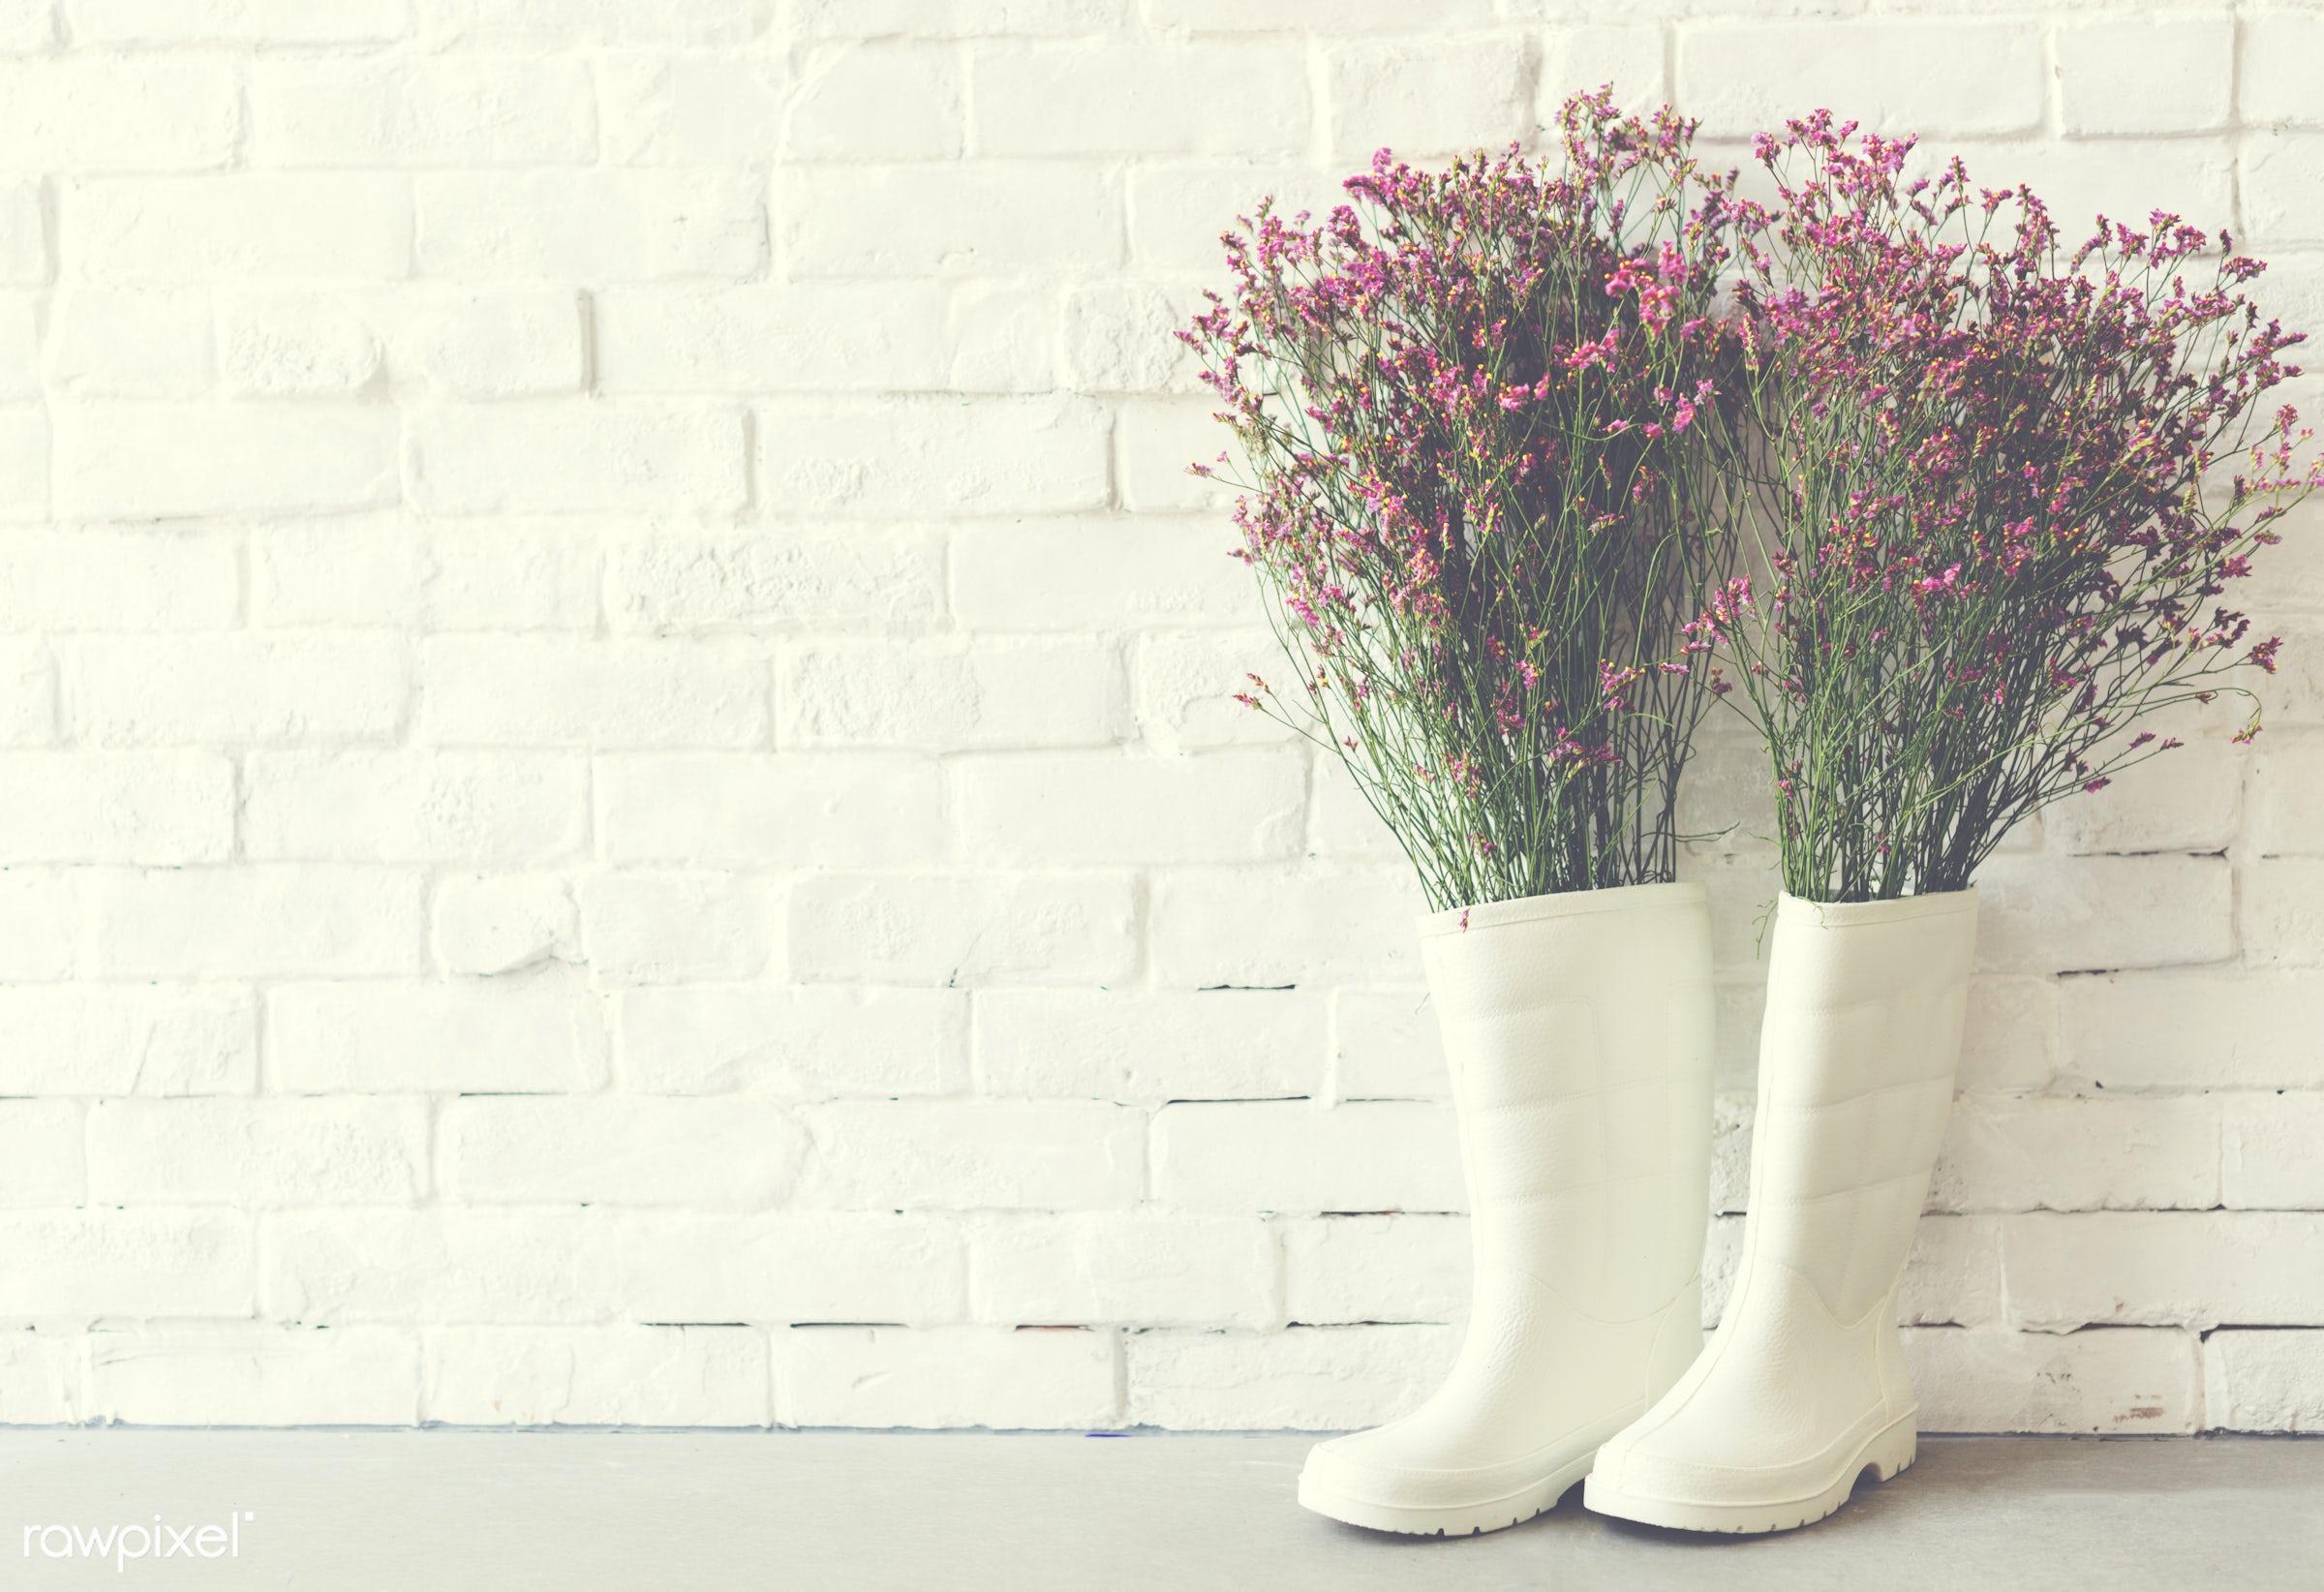 background, be creative, beautiful, beauty, black, bloom, boot, bricks, color, creative, decor, decoration, design,...